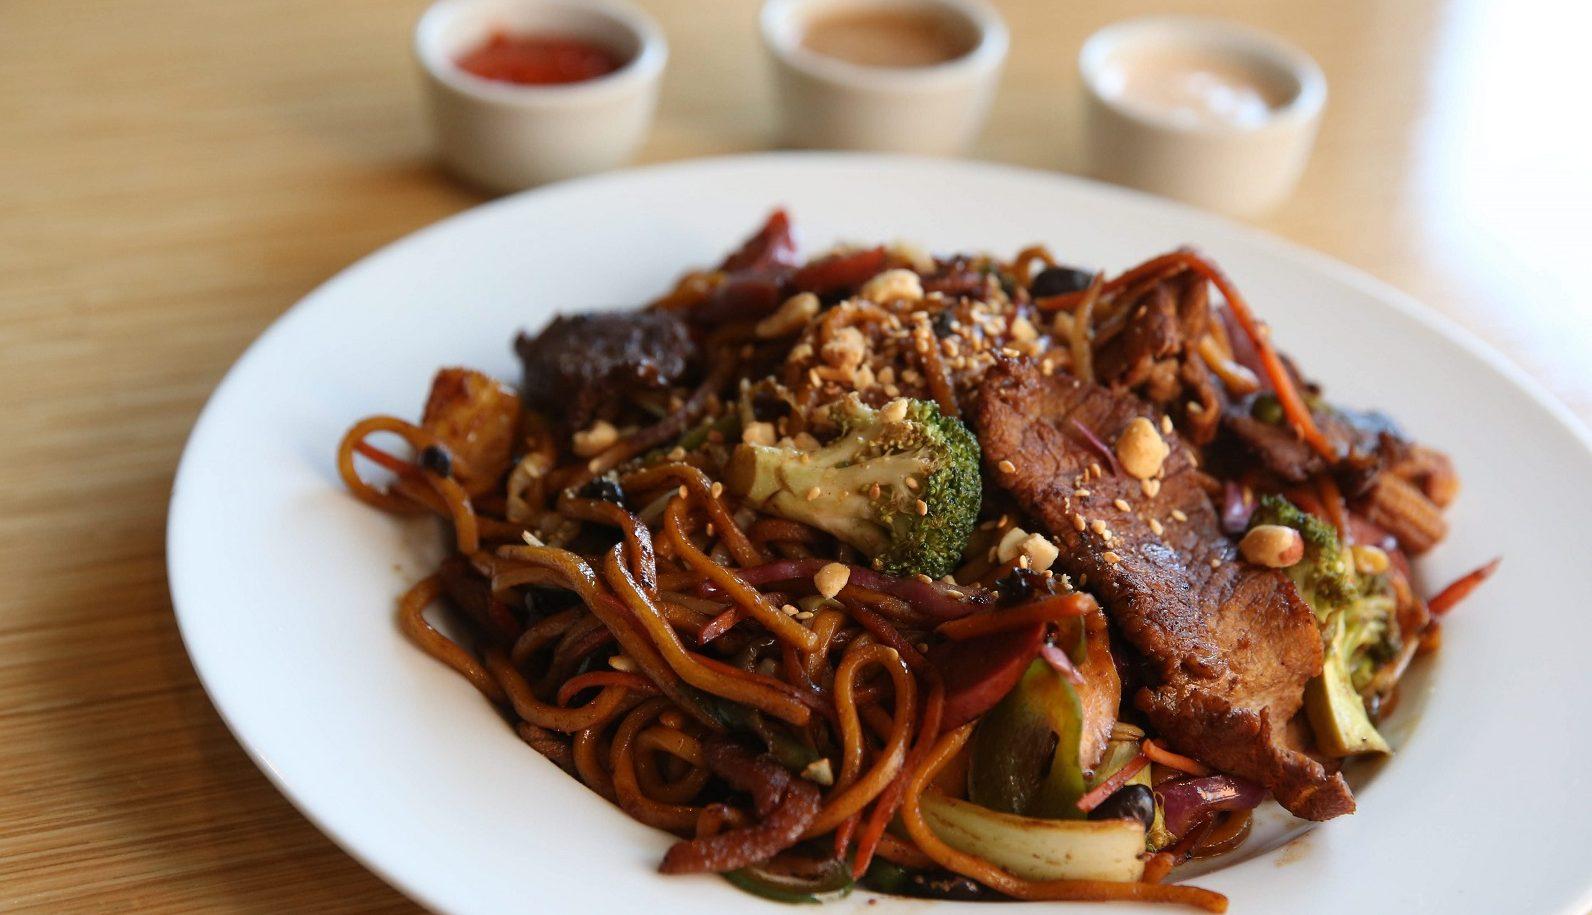 Shogun Teriyaki with meat, vegetables, lo mein noodles, garlic, red wine vinegar, shogun teriyaki sauce and Korean barbecue sauce.  (Sharon Cantillon/Buffalo News)